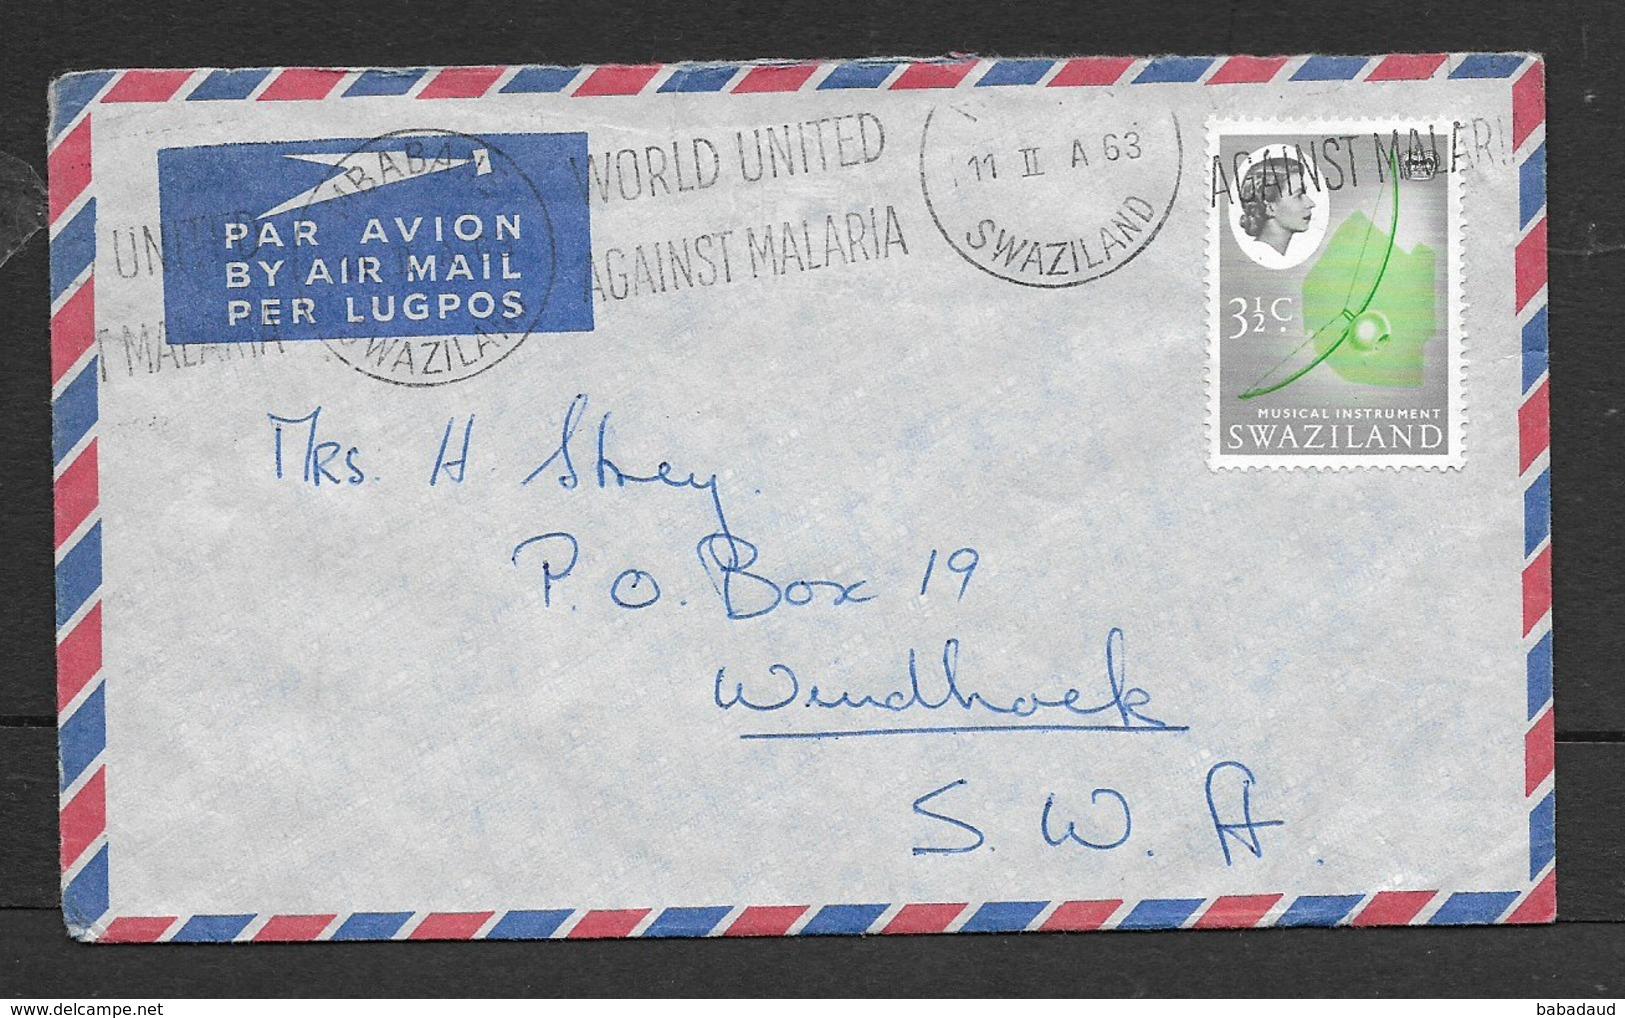 Swaziland, 3 1/2c Air Mail MBABANE 11 II 63 + WORLD UNITED AGAINT MALARIA > Windhoek, SWA - Swaziland (...-1967)